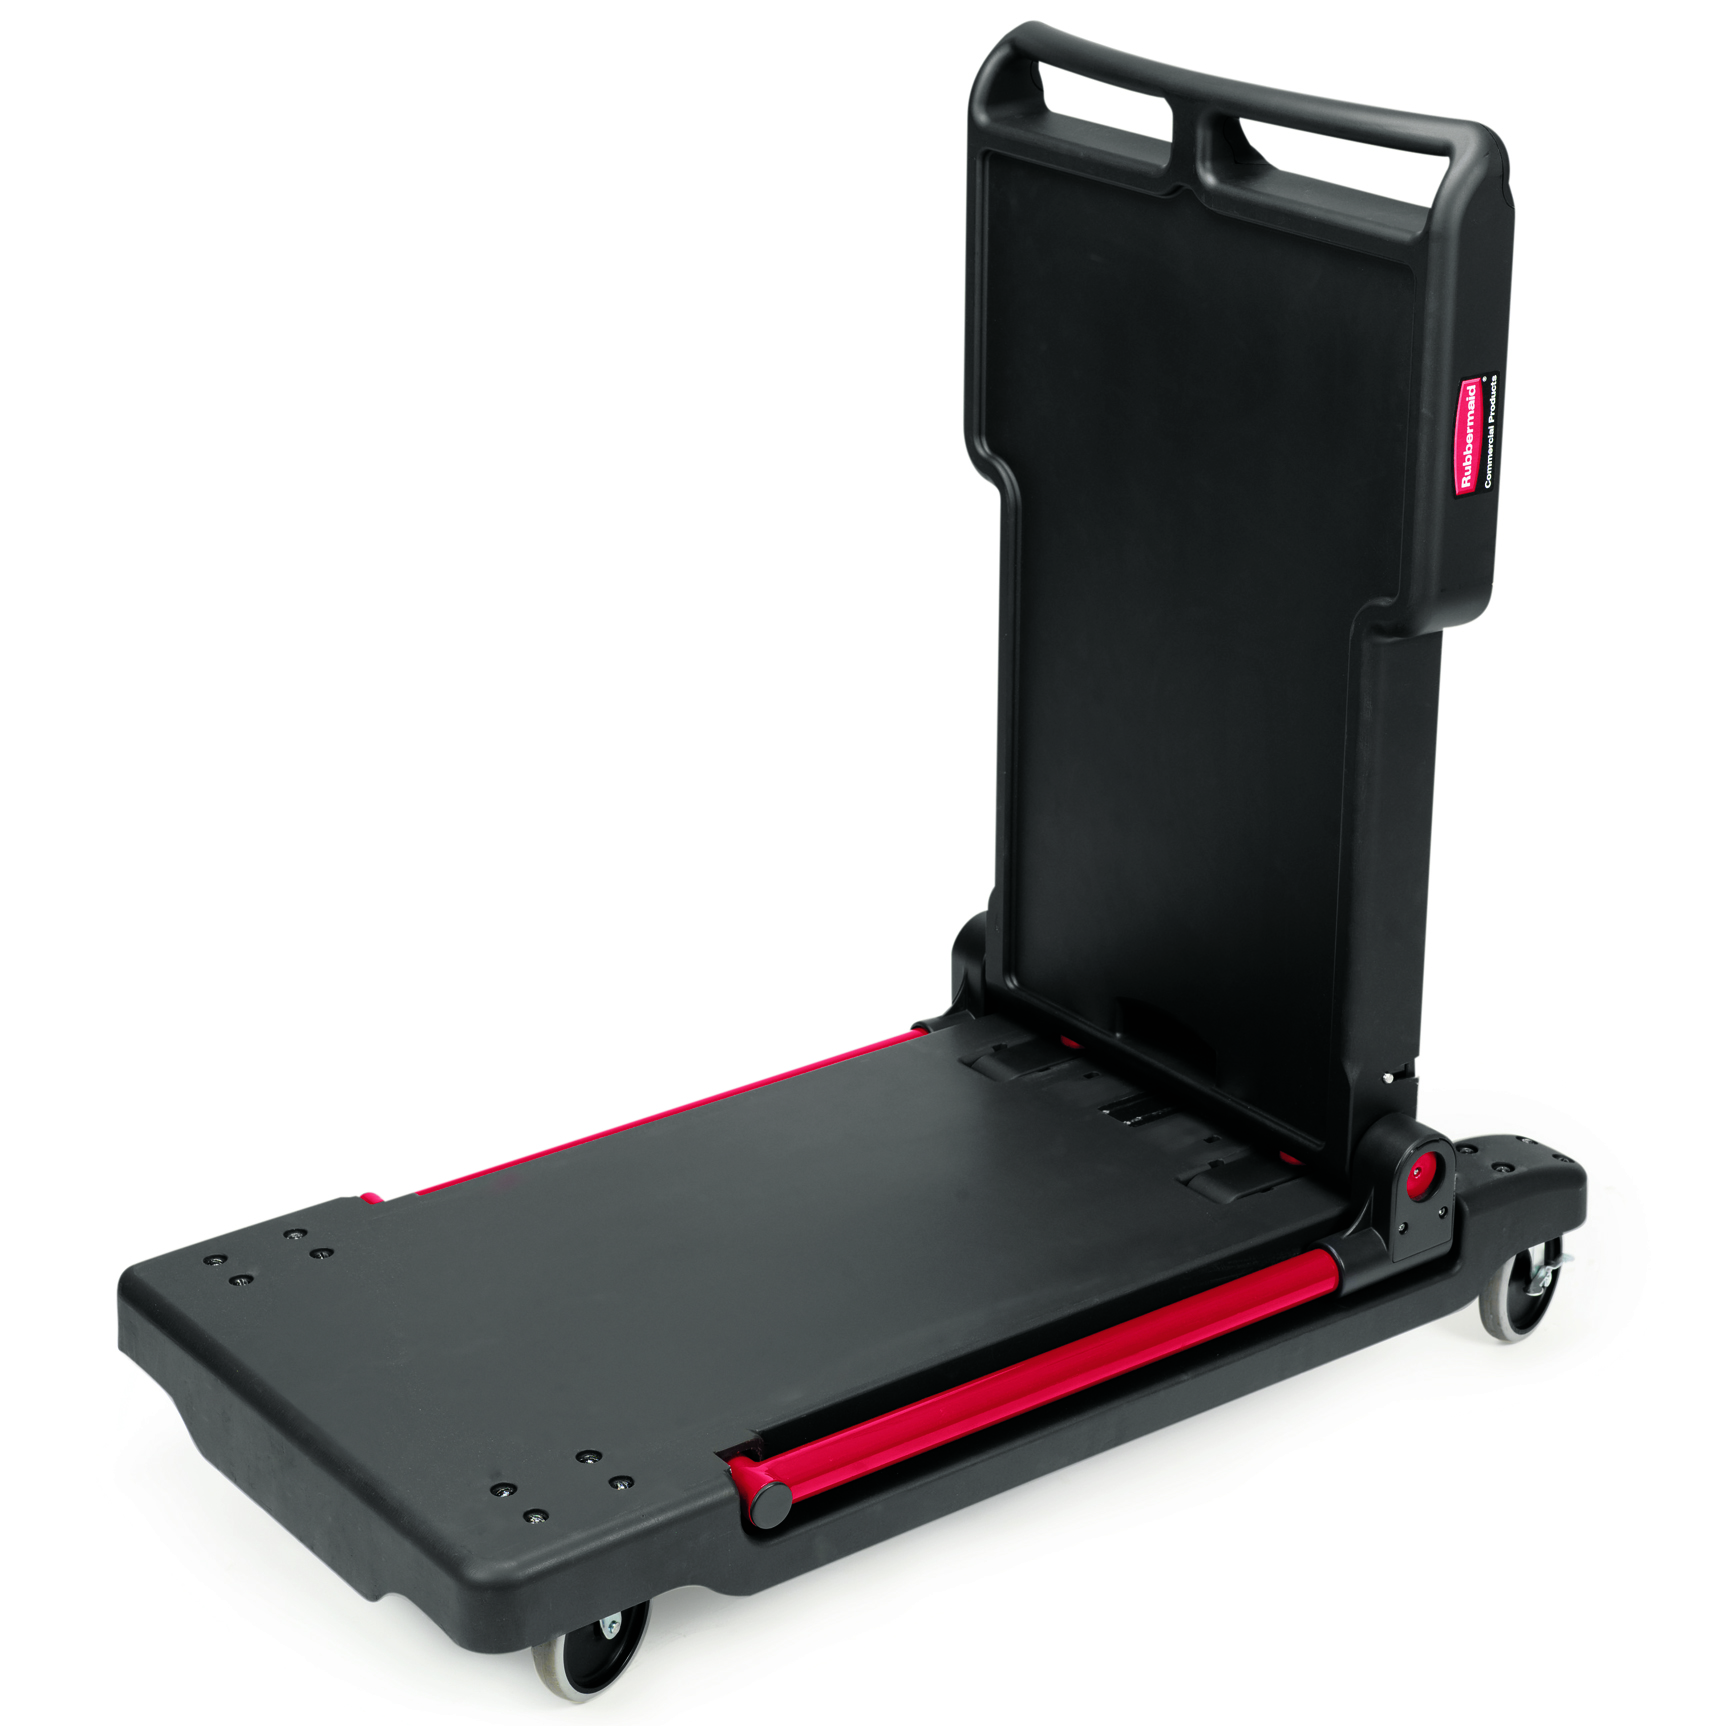 twoshelf convertible utility cart - Rubbermaid Utility Cart